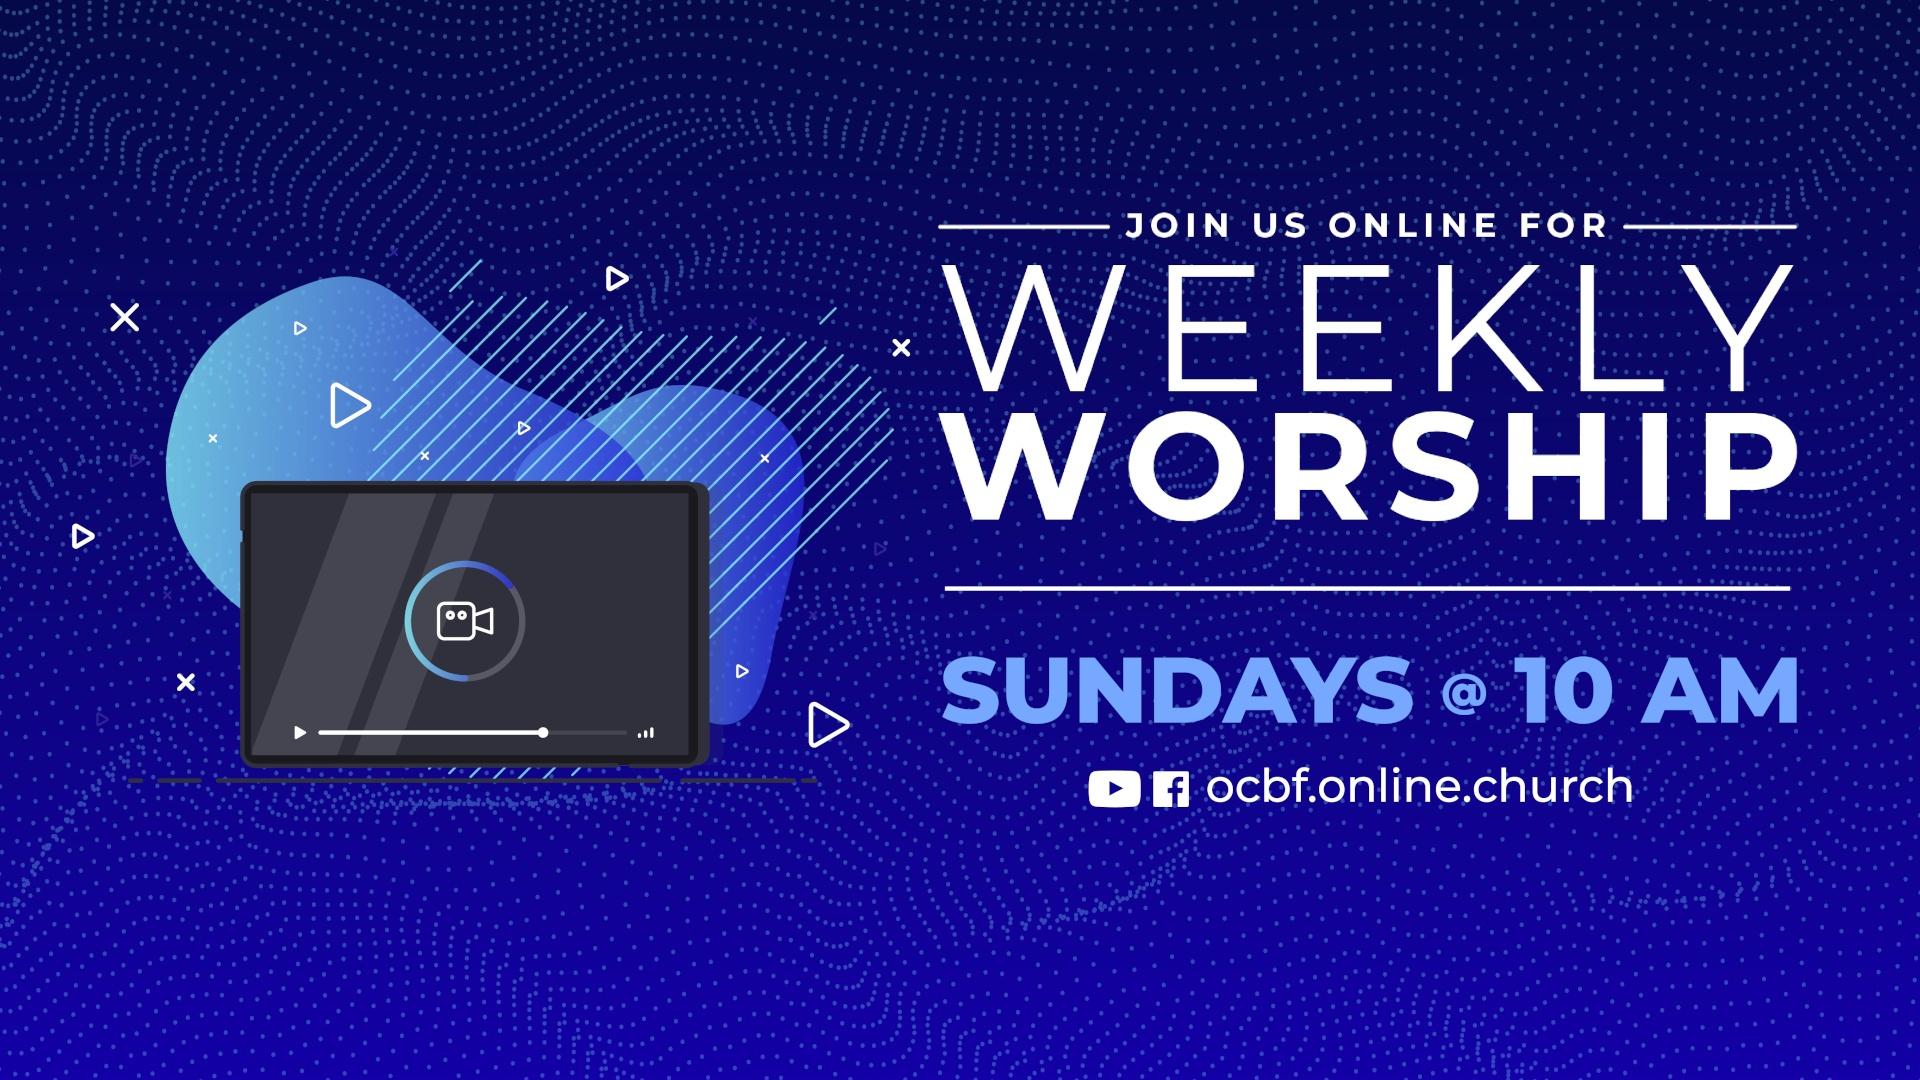 OCBF weekly worship Sundays at 10 am on YouTube, Facebook, and ocbf.online.church